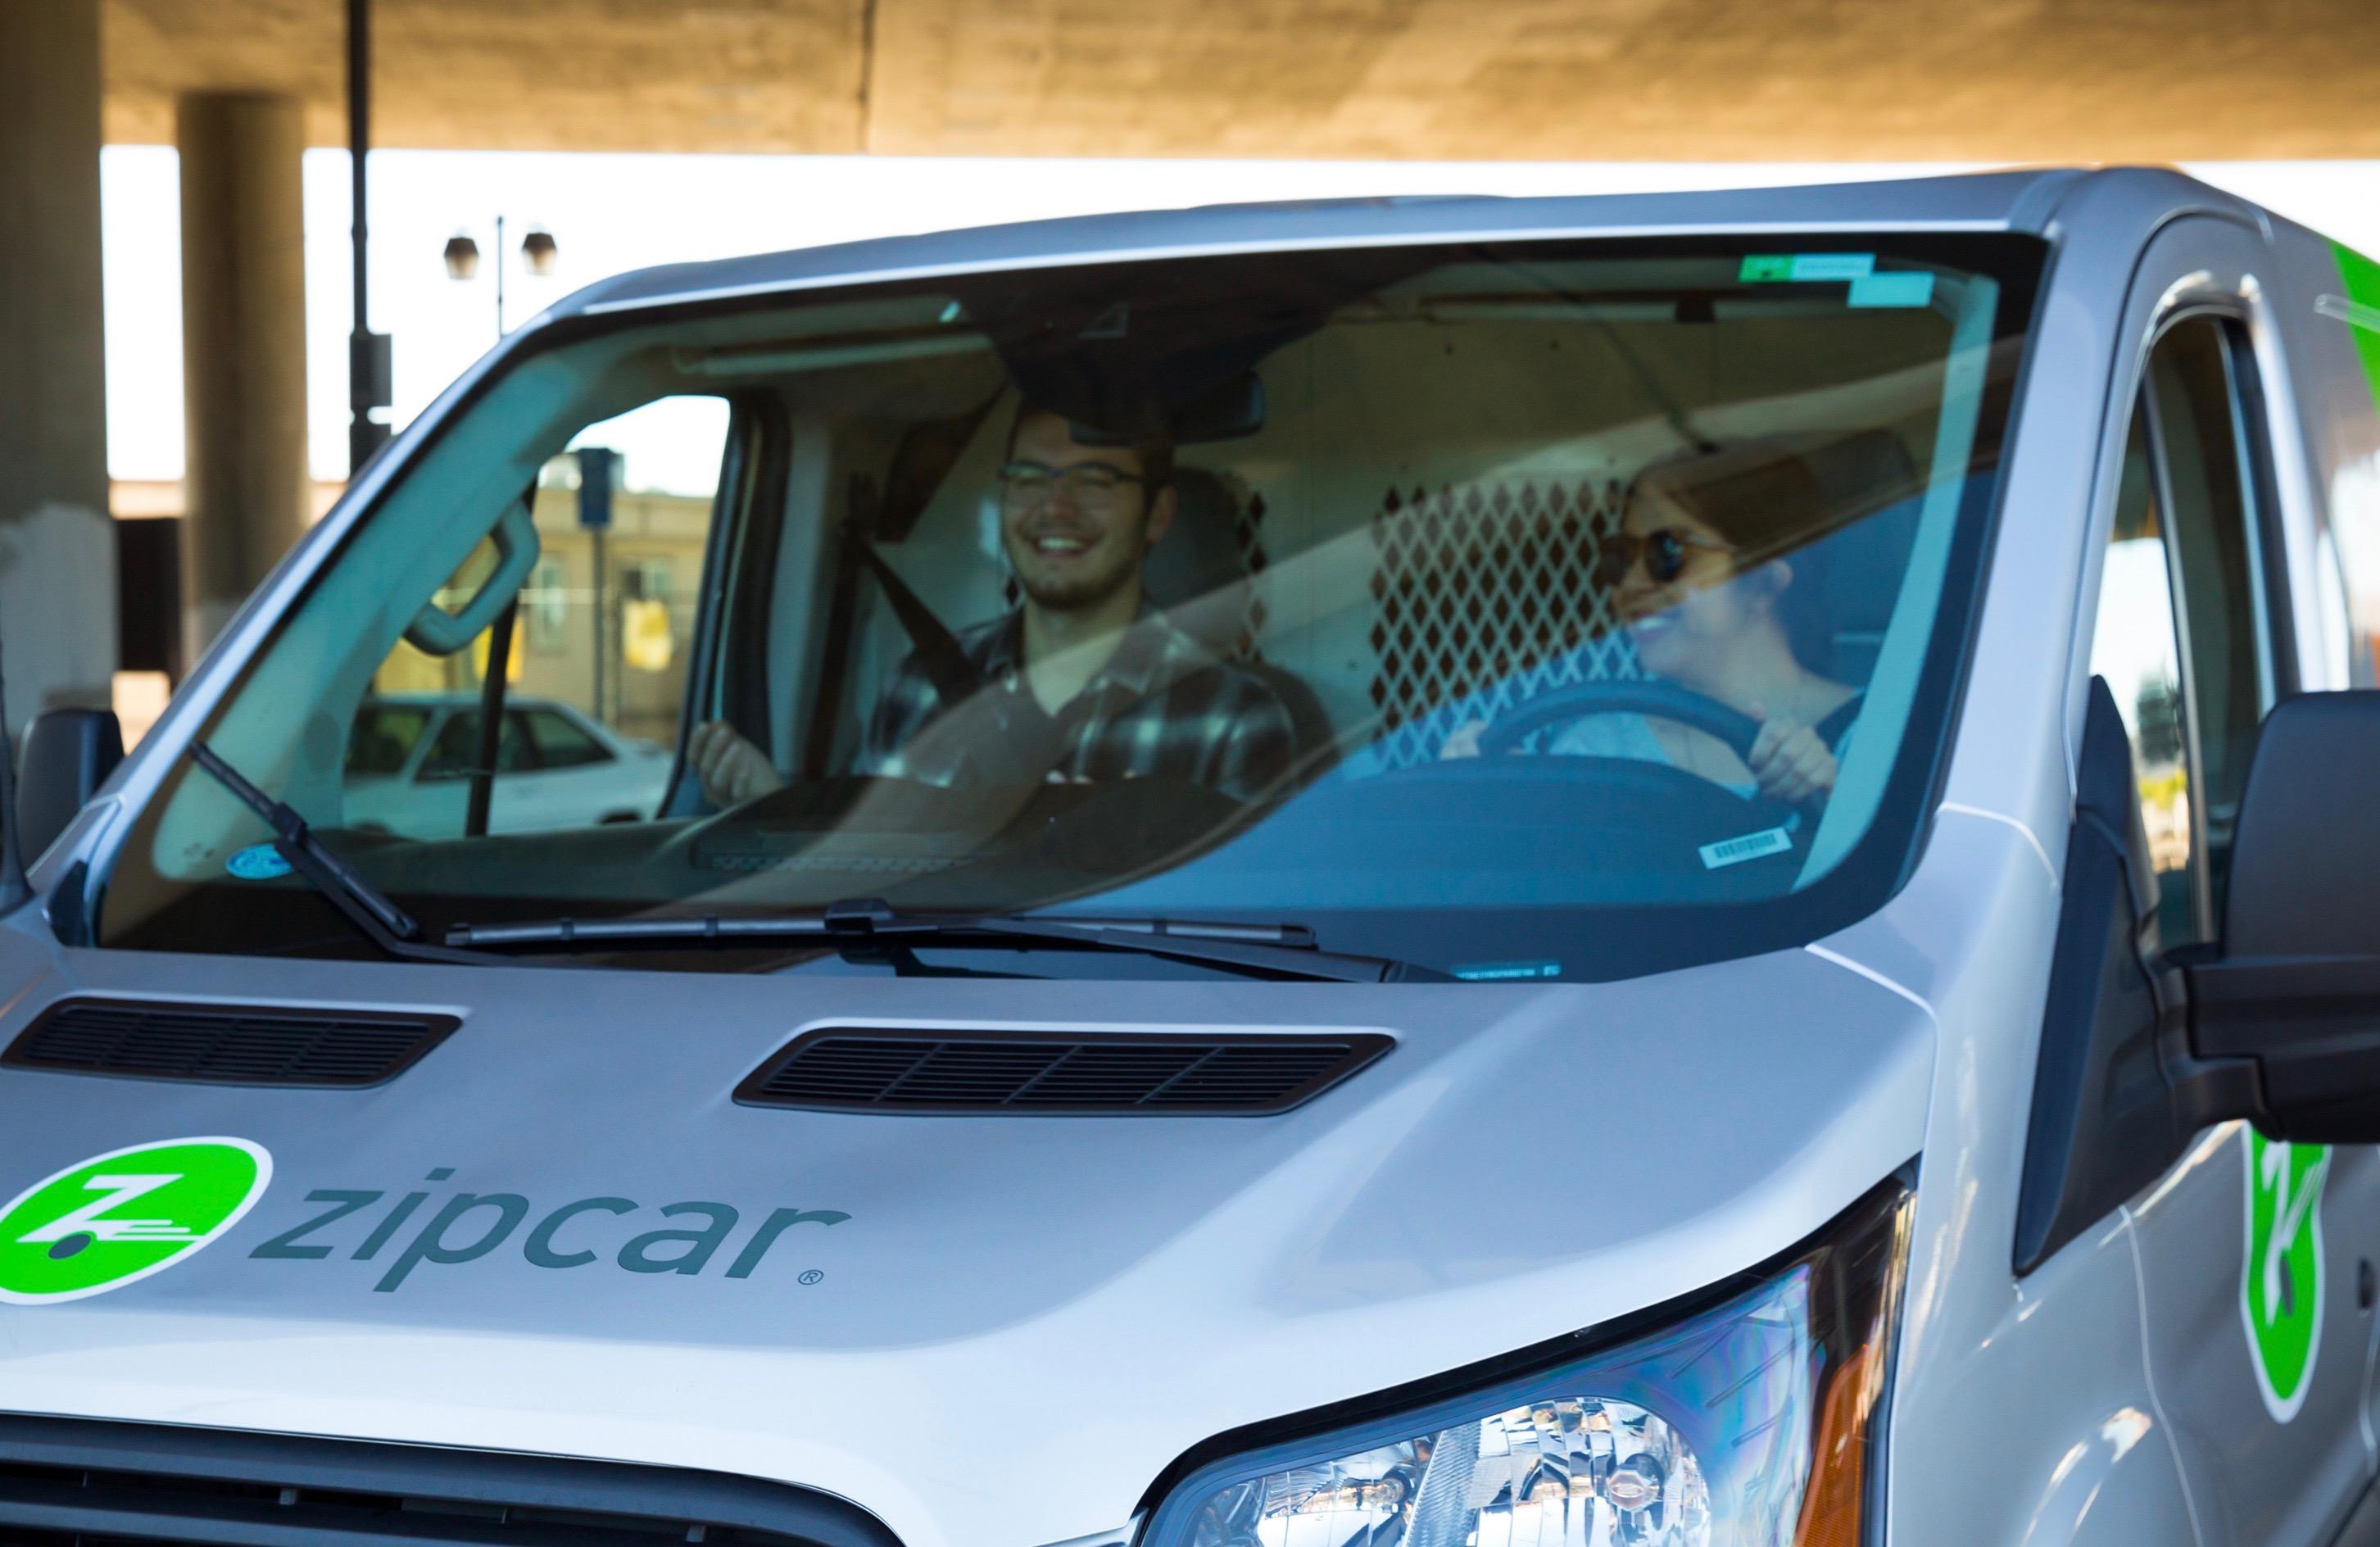 Zipcar transit van